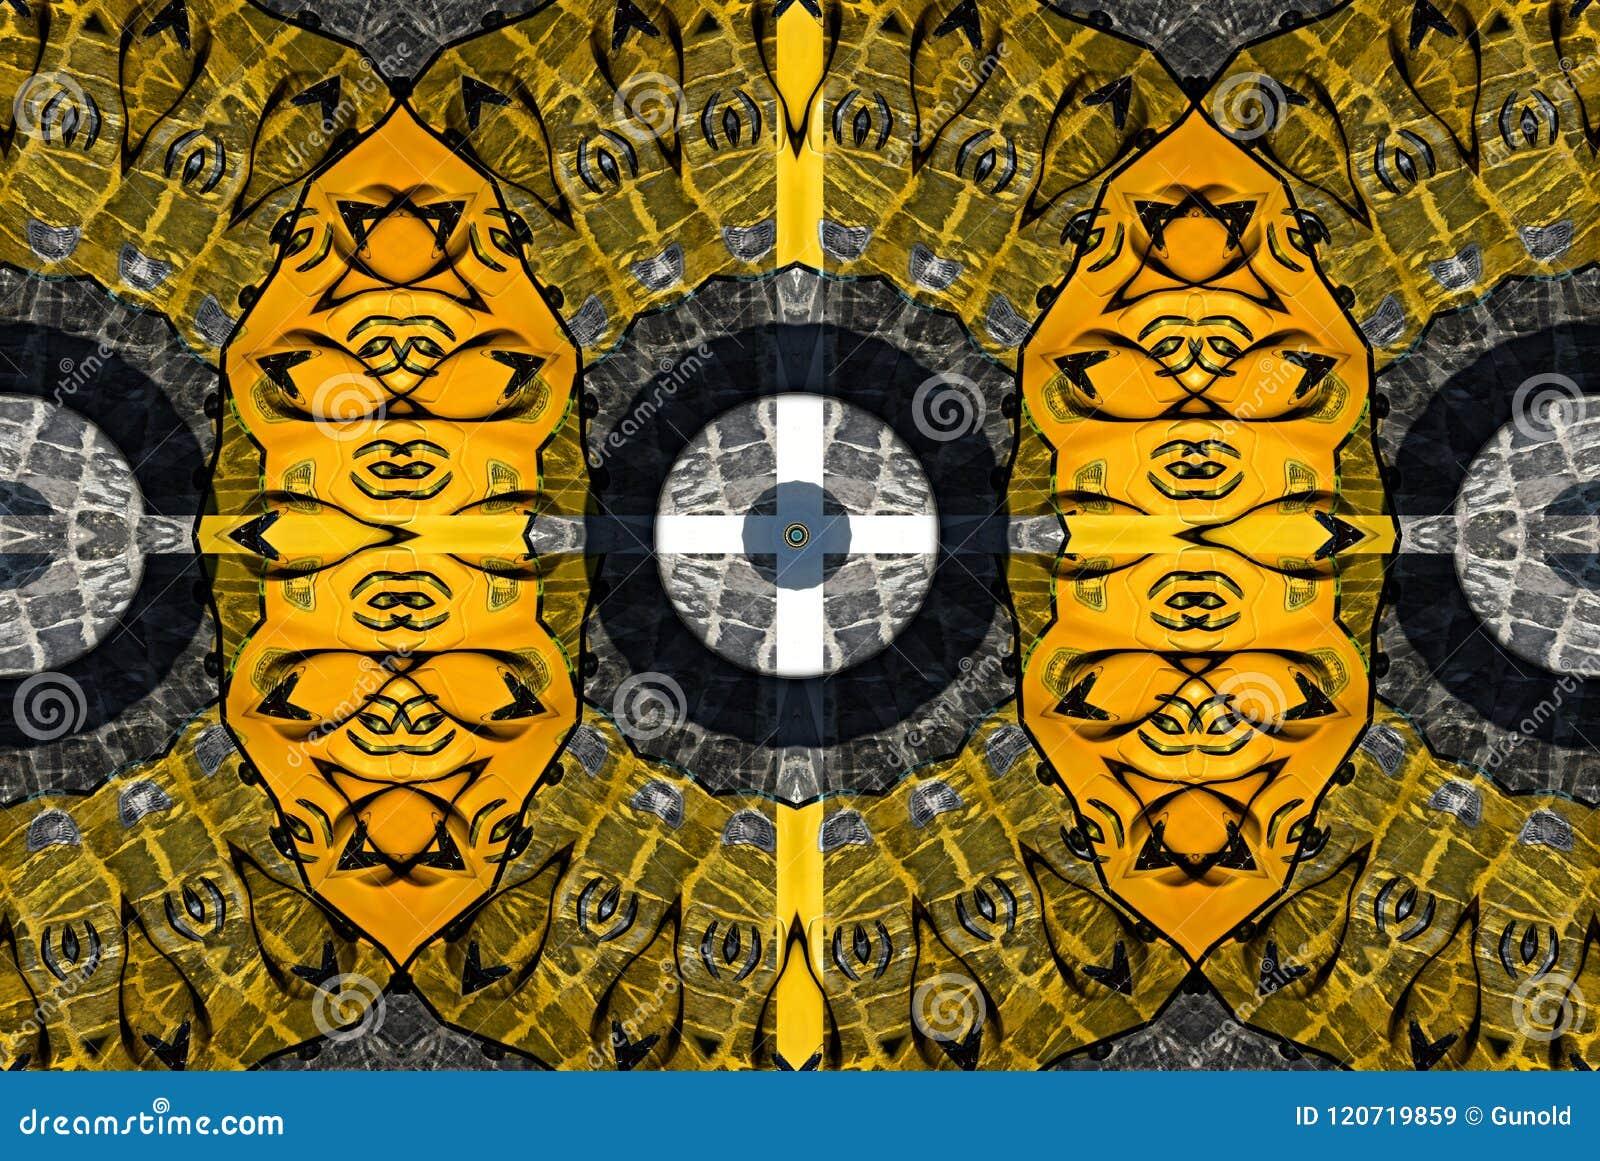 Mysteriously digital art design of interlocking circles